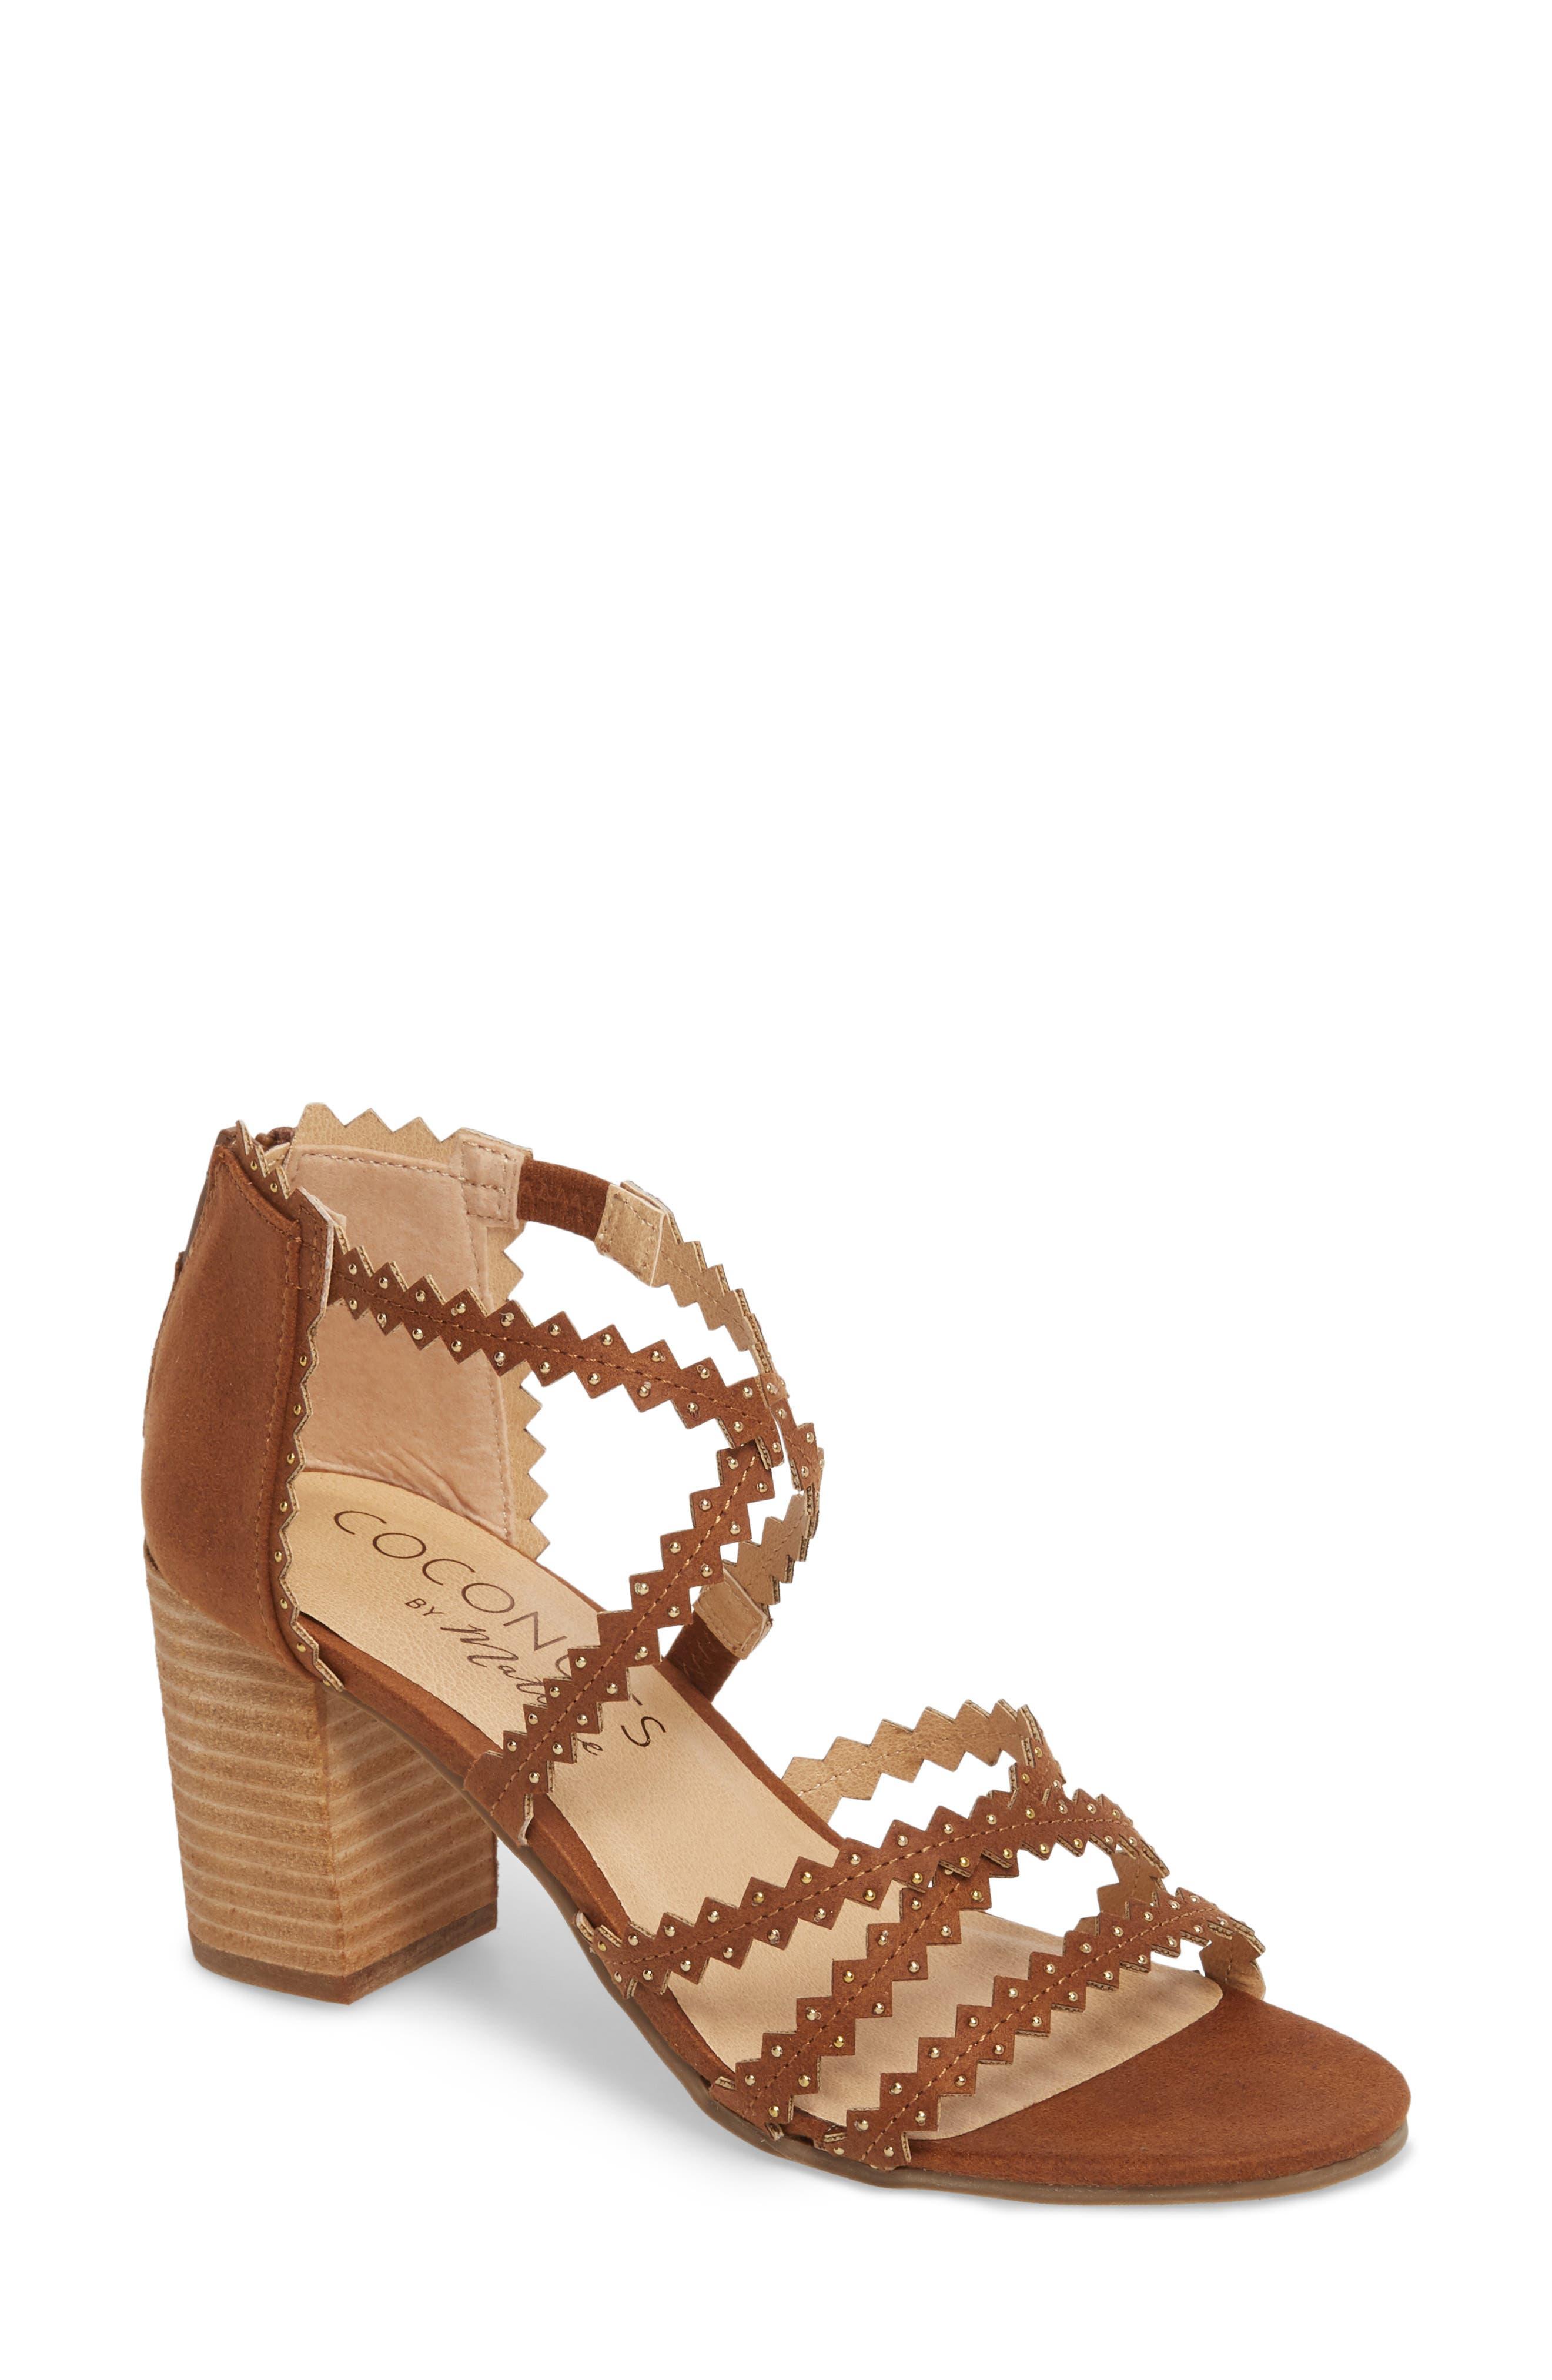 Aiden Block Heel Sandal,                         Main,                         color, SADDLE SUEDE